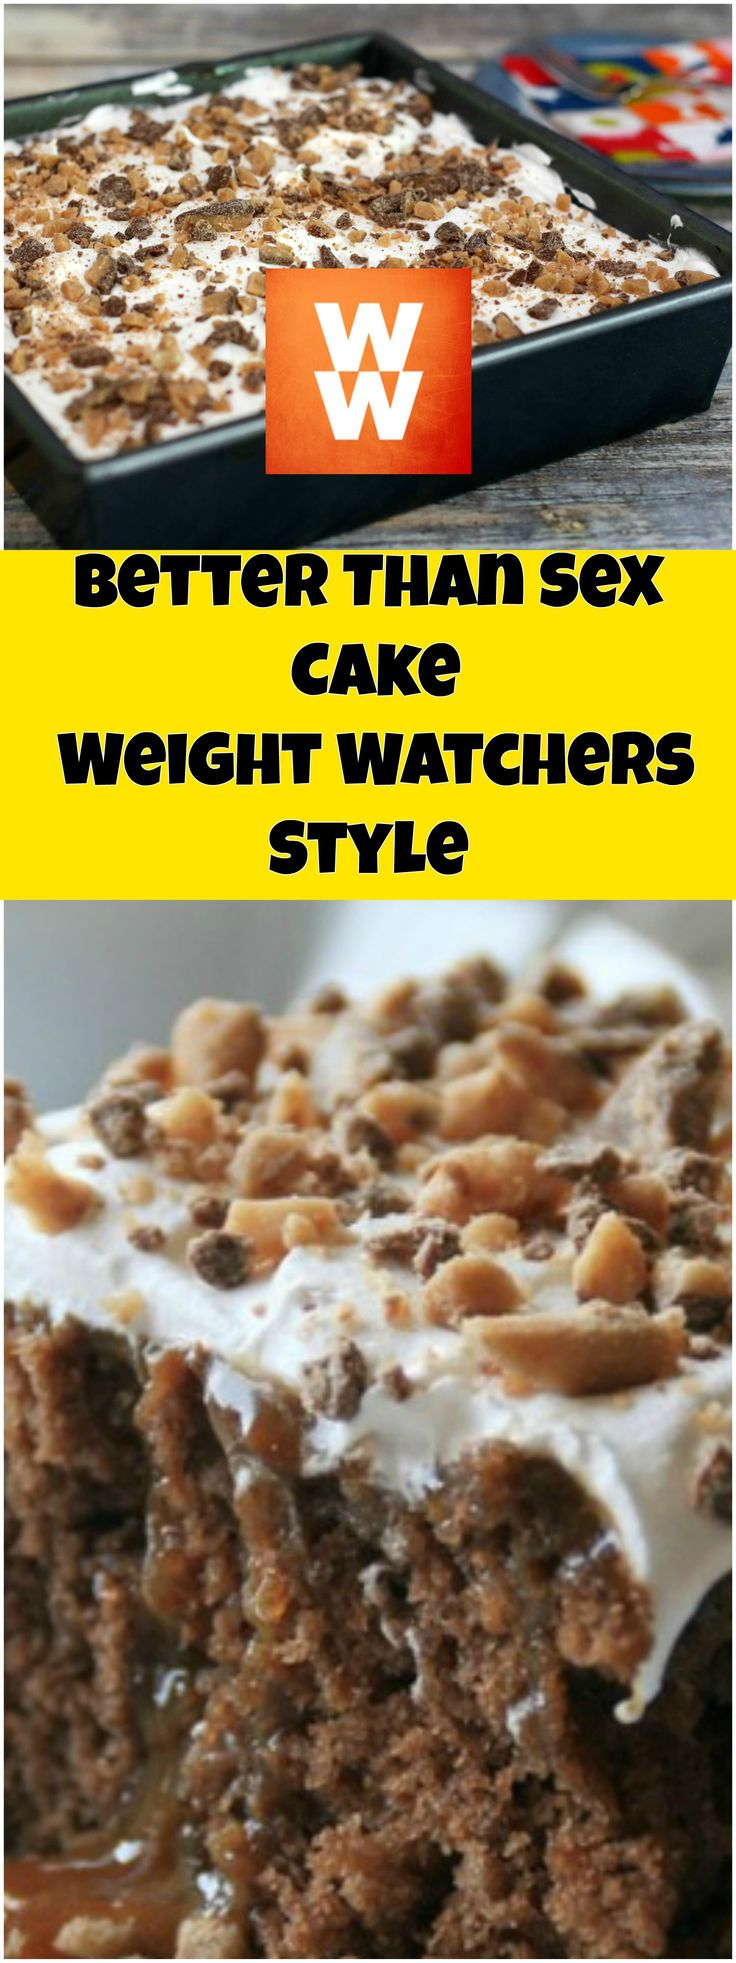 Better+Than+Sex+Cake-Weight+Watchers+Style